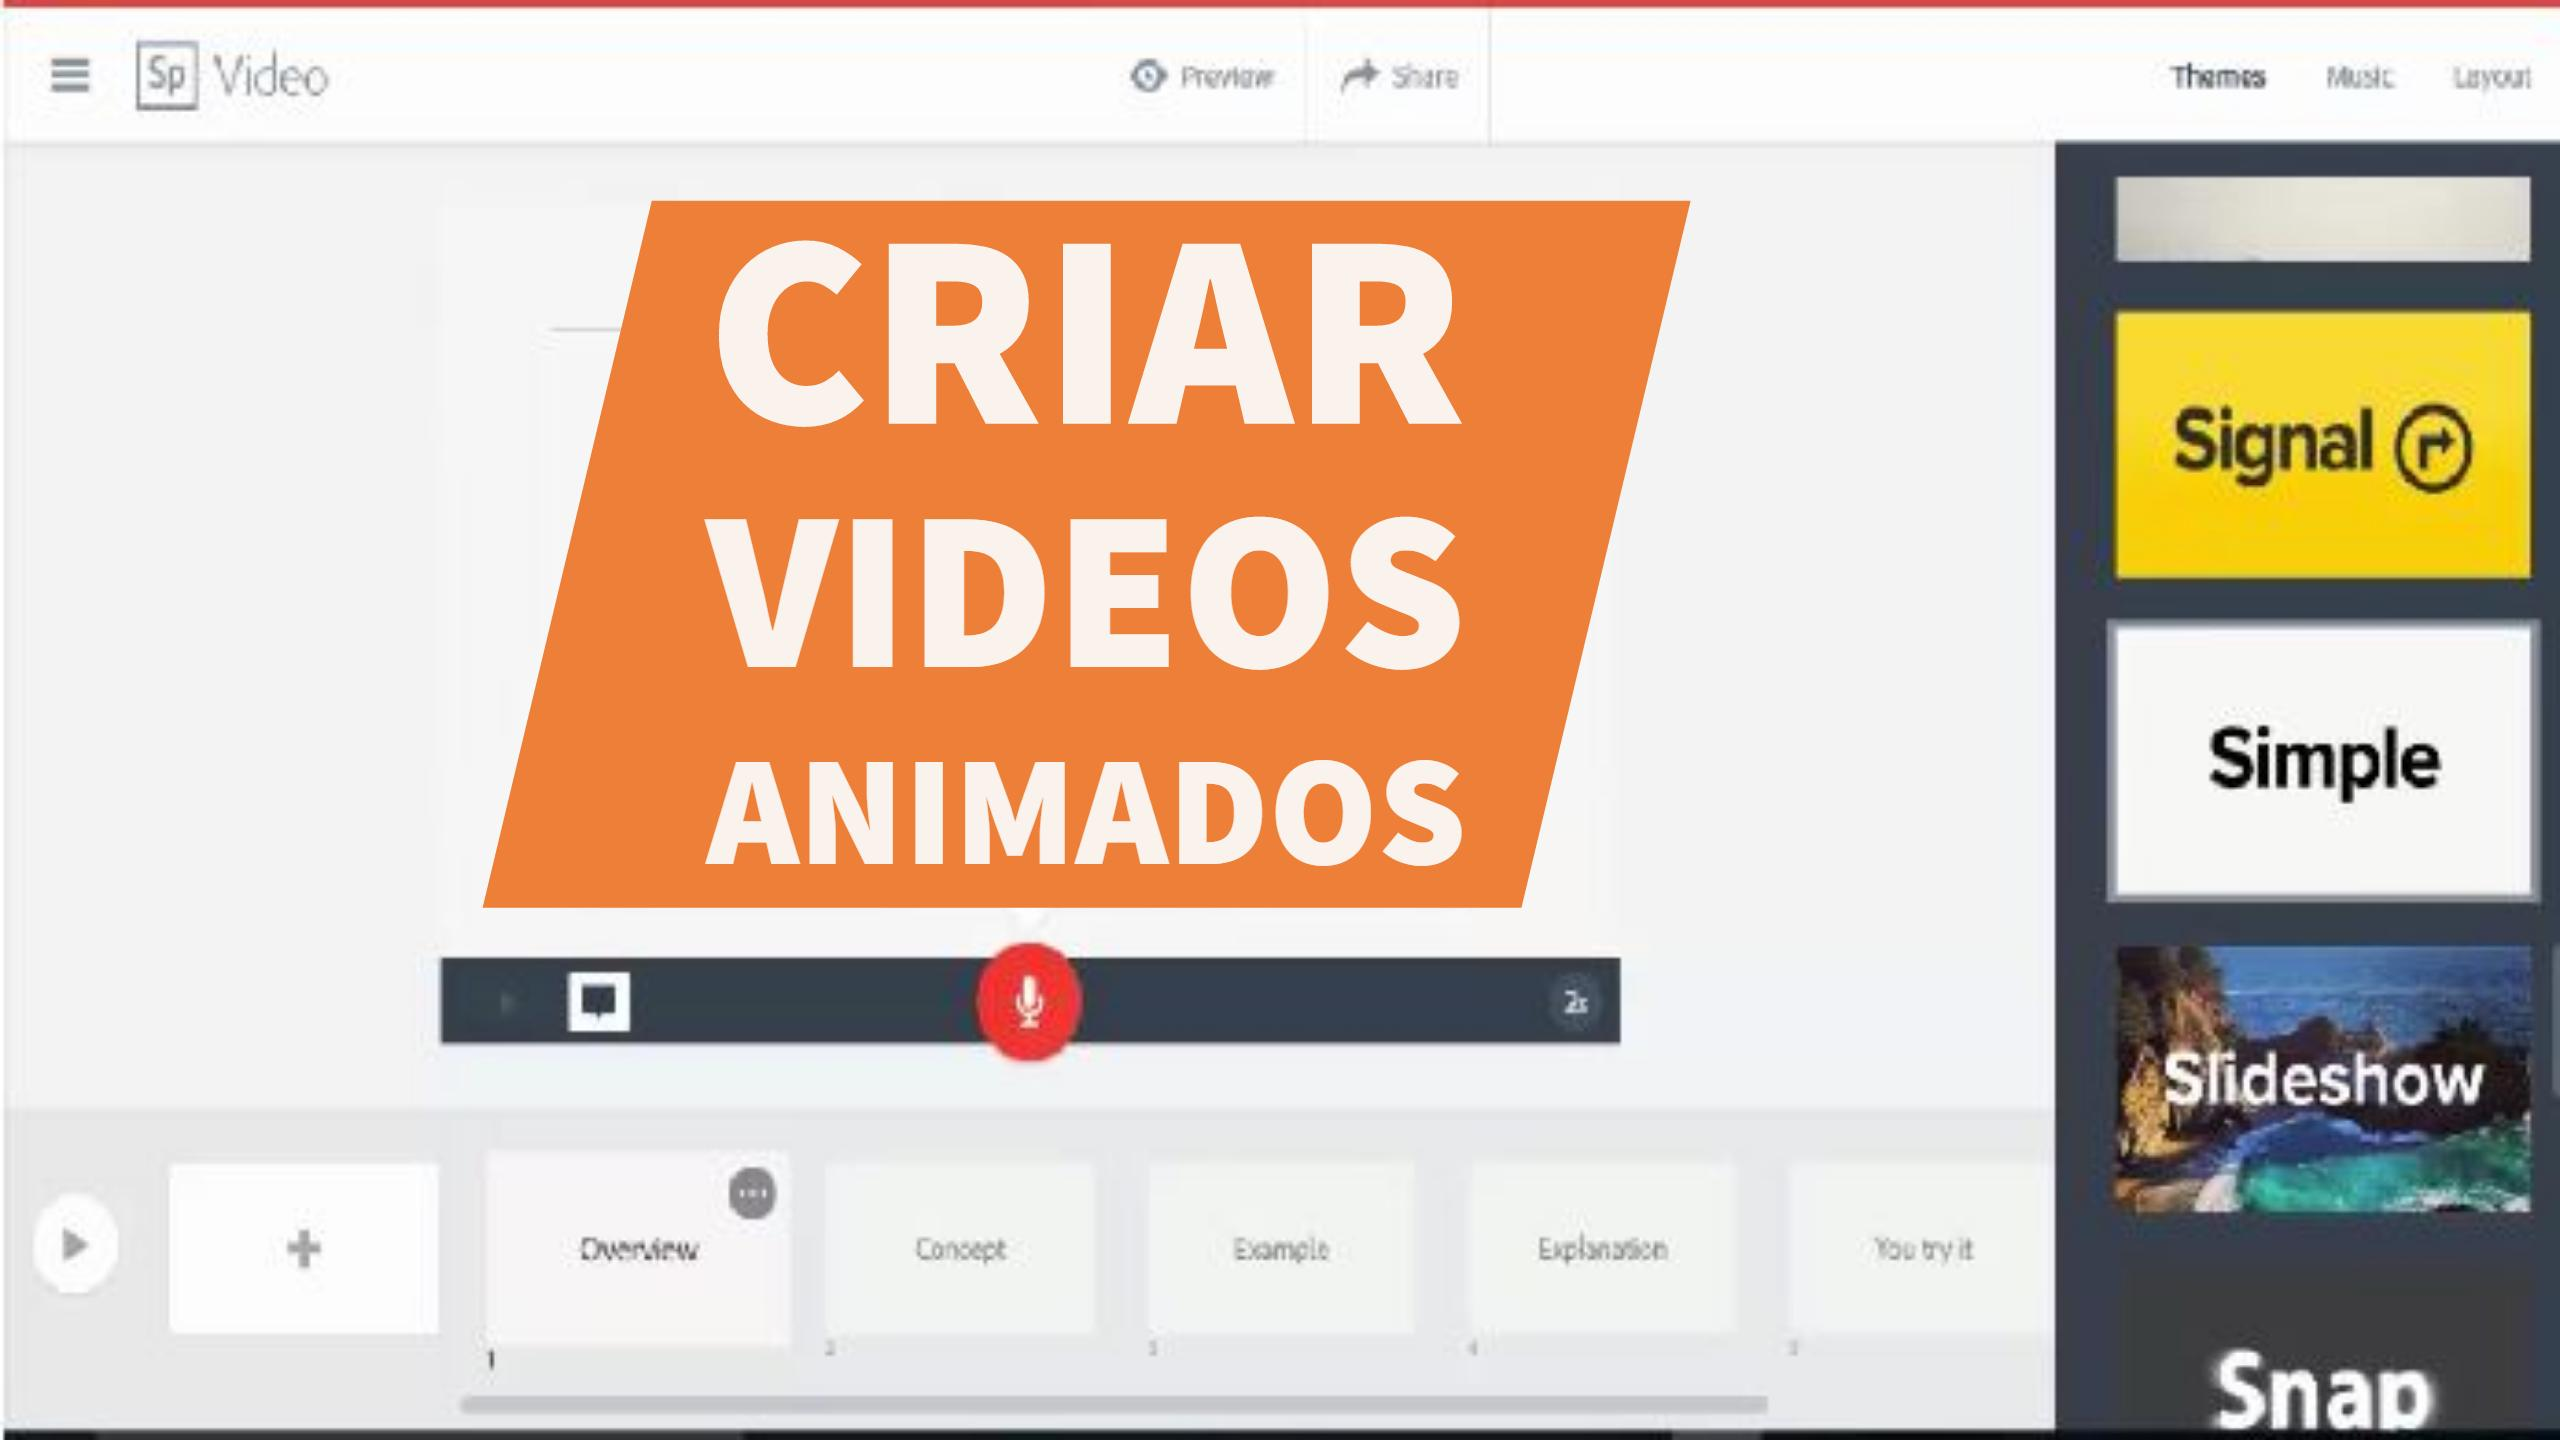 Criar Vídeos Animados